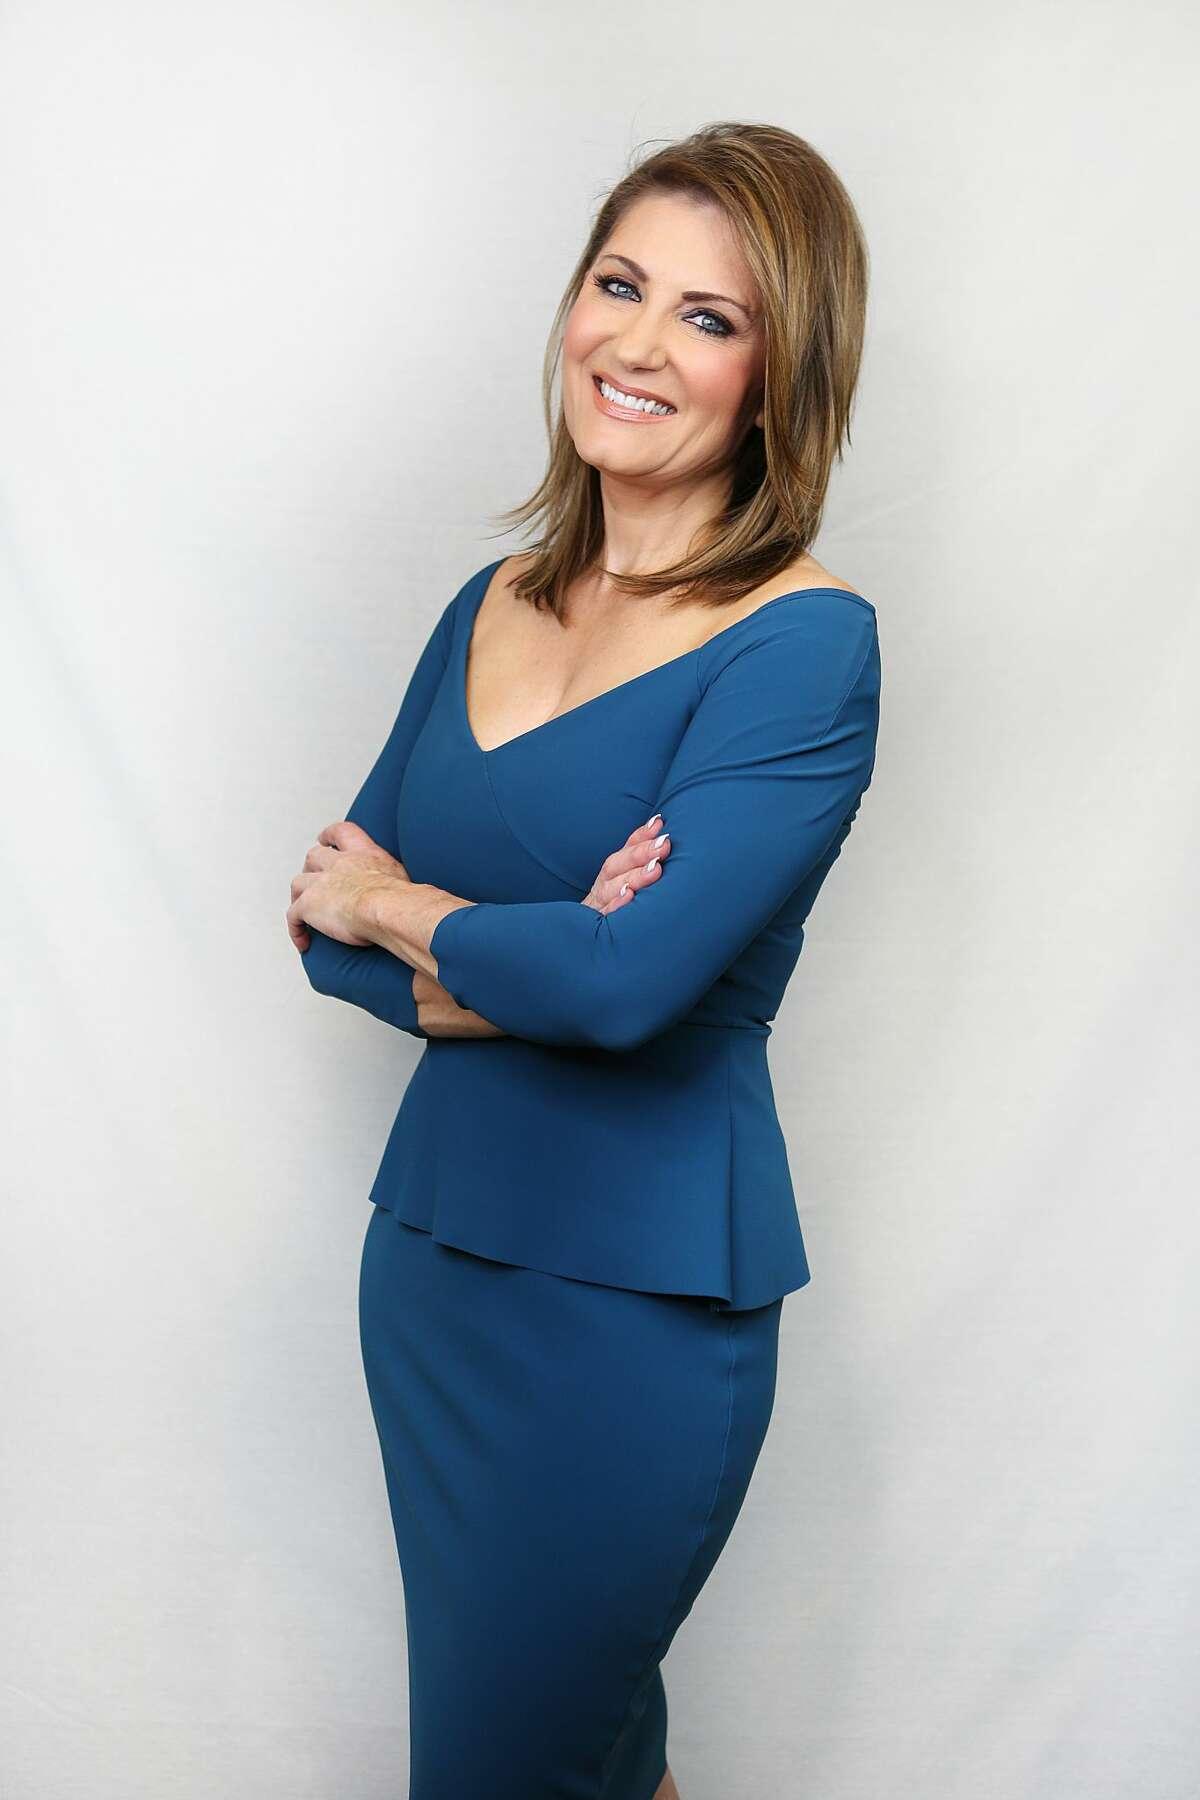 Former TV anchor Leslie Bohl joins Noisy Trump Public Relations.